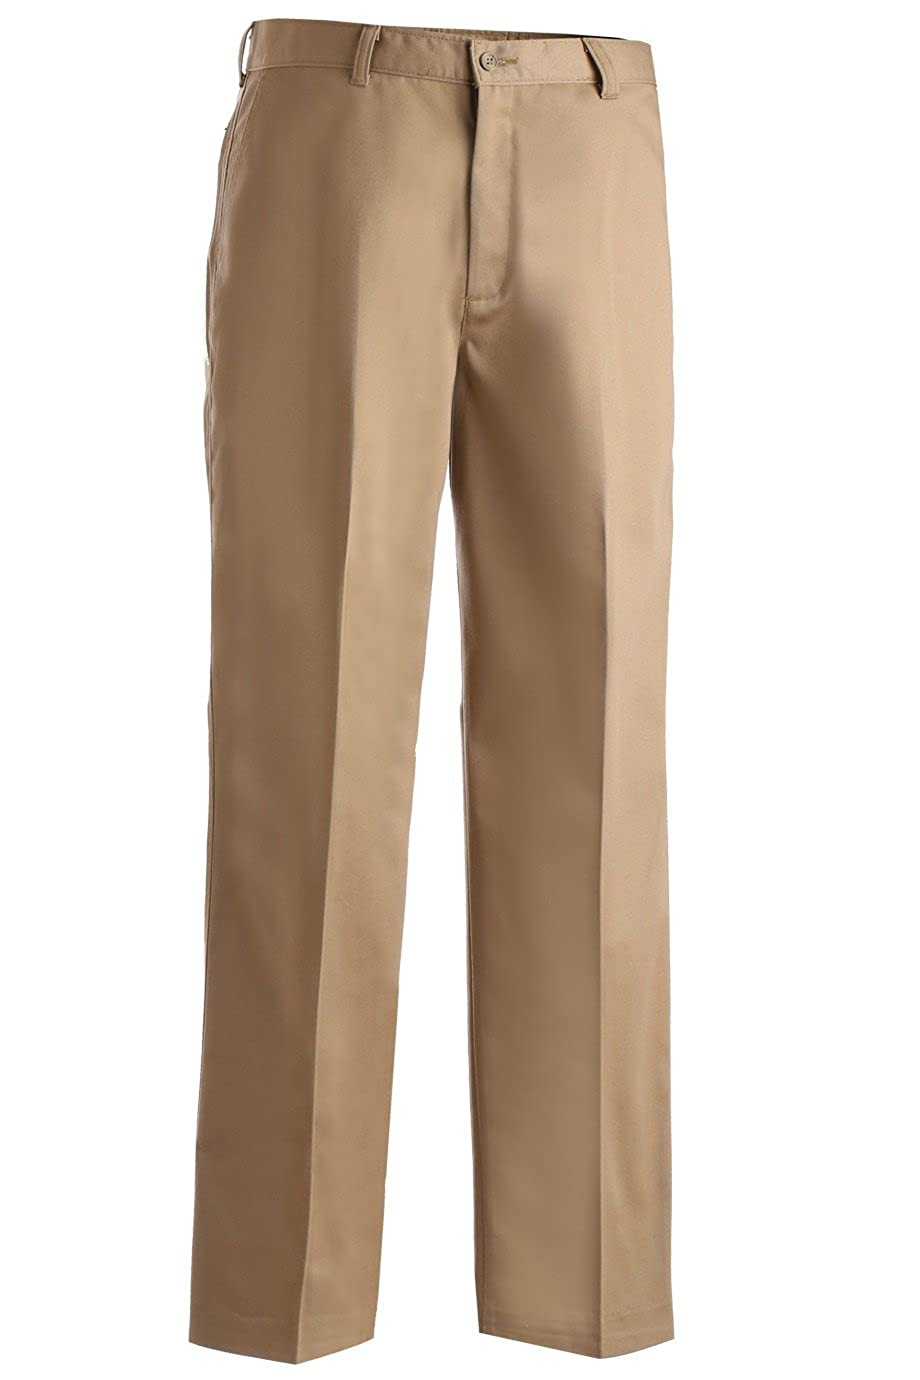 Edwards Garment Men's Fashion Moisture Wicking Pocket Chino Pant 2570